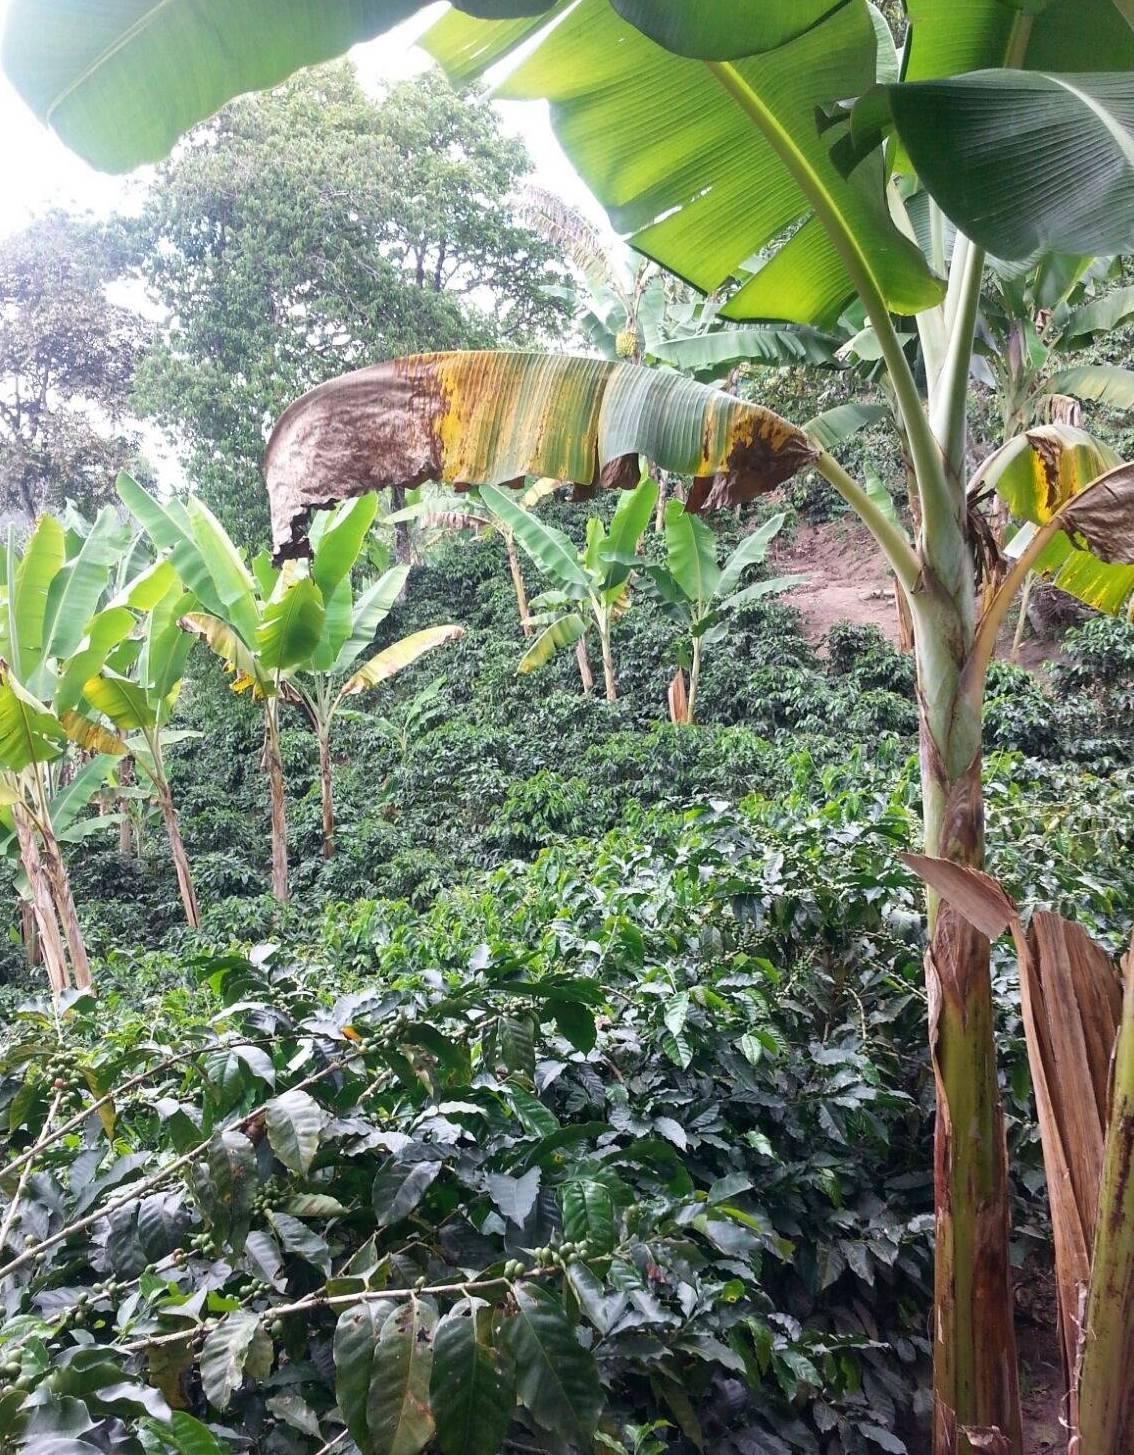 Coffee plantation on the outskirts of Salento.